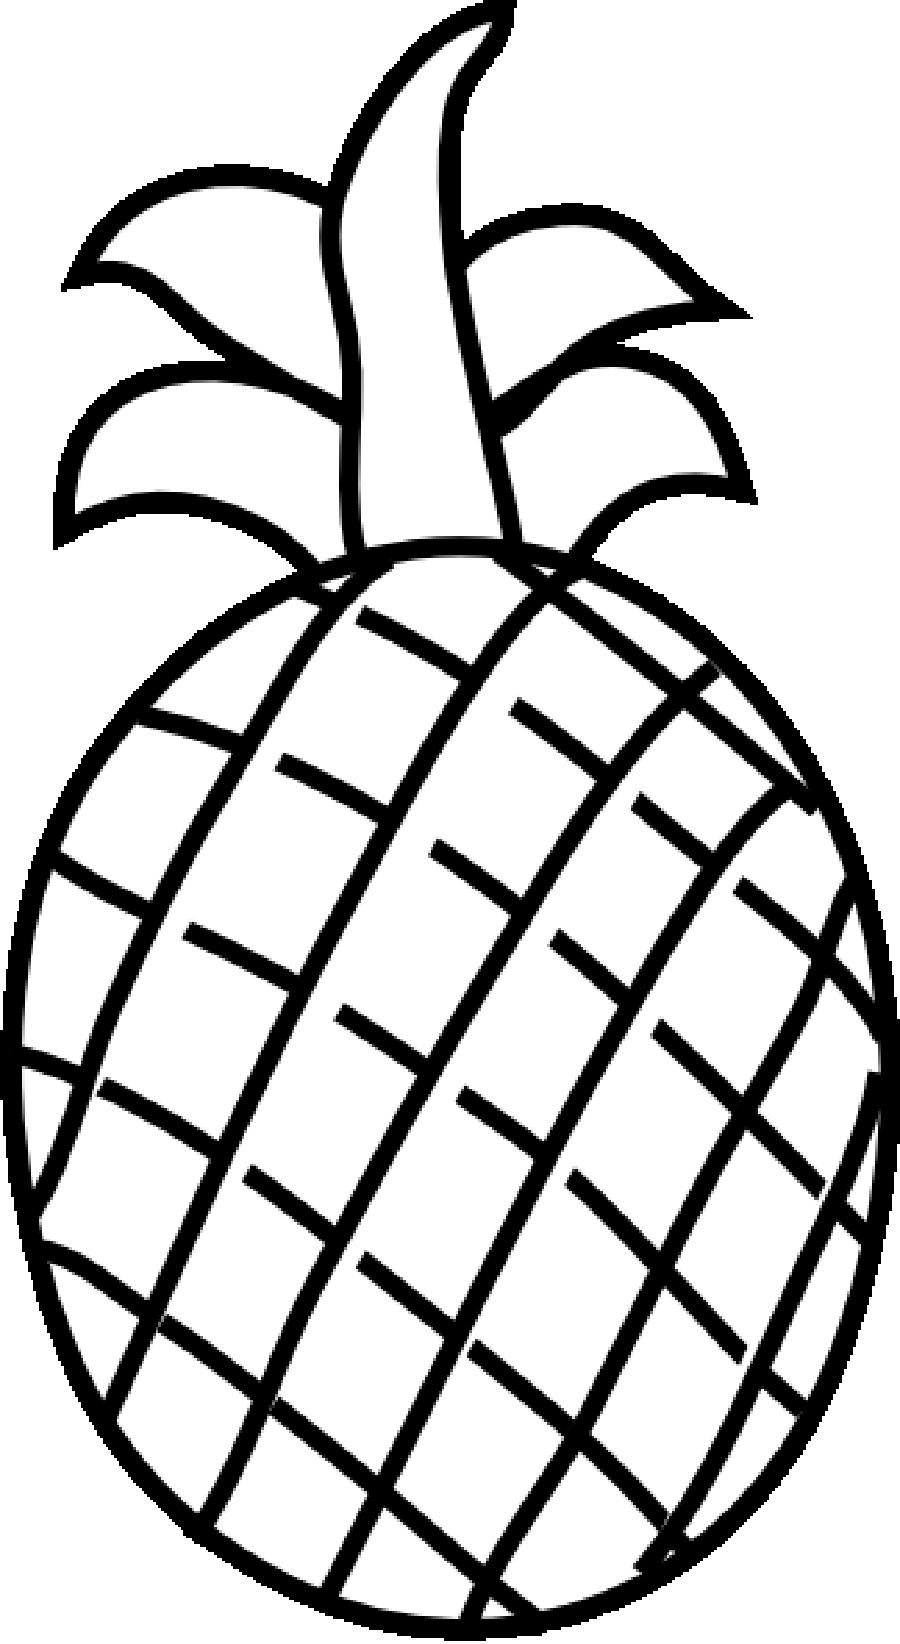 Ripe Pineapple Fruit.